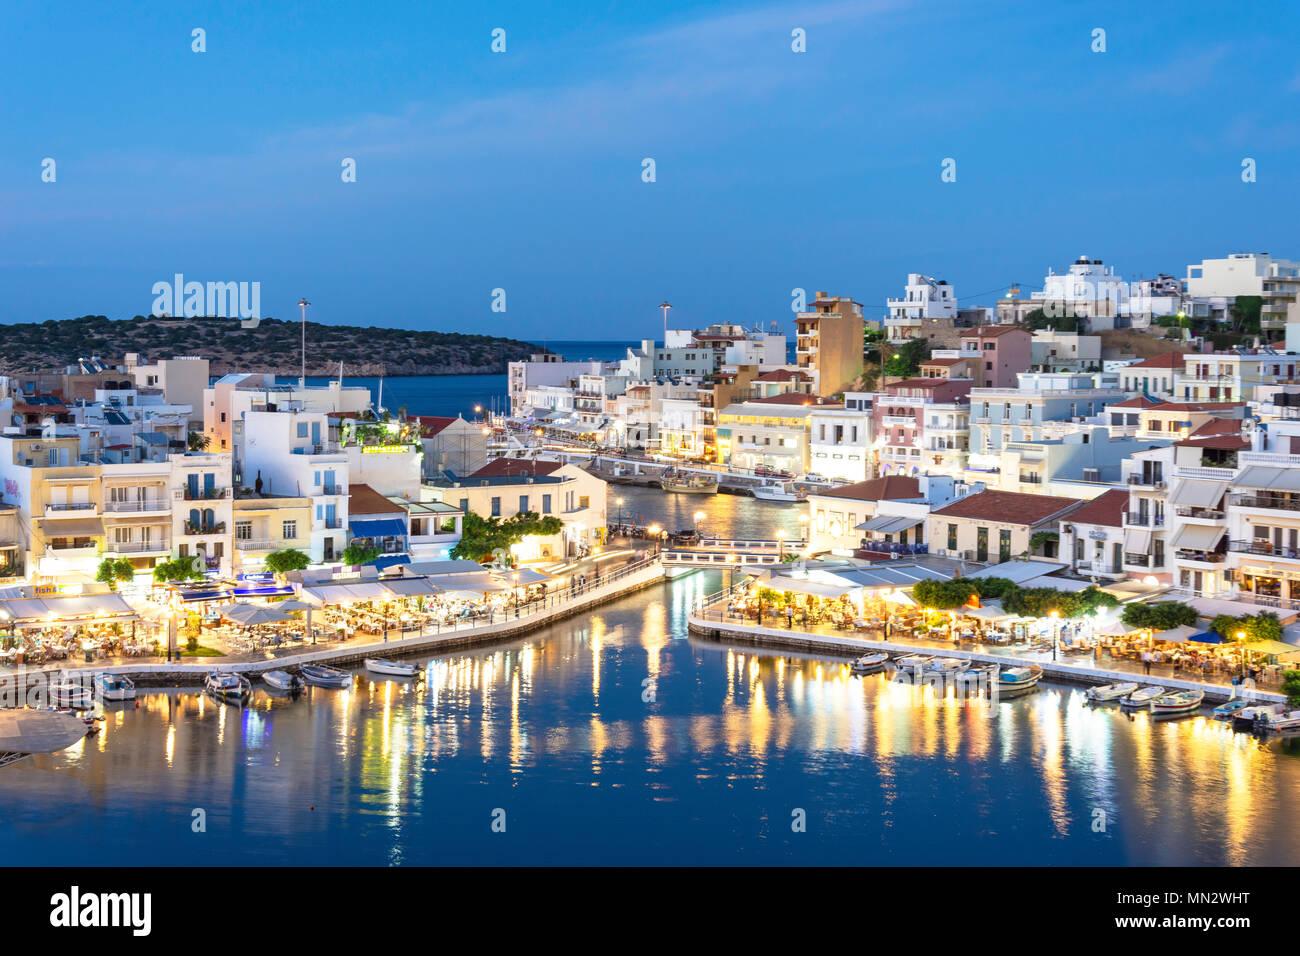 View of town and harbour at dusk, Agios Nikolaos, Lasithi Region, Crete (Kriti), Greece - Stock Image